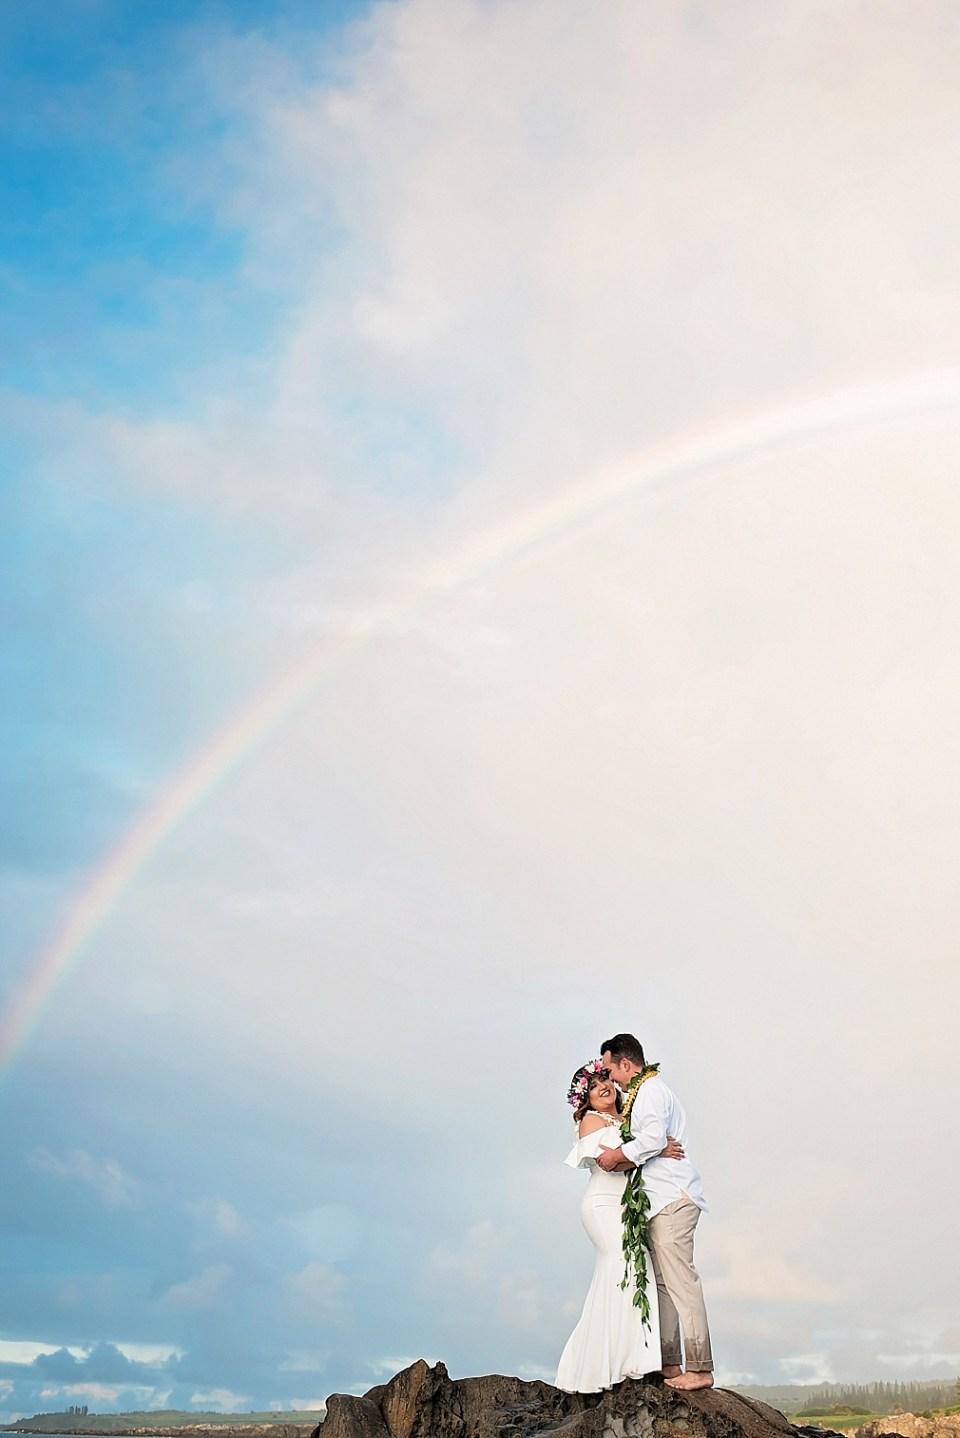 Dramatic wedding rainbows at Ironwood Beach in Kapalua